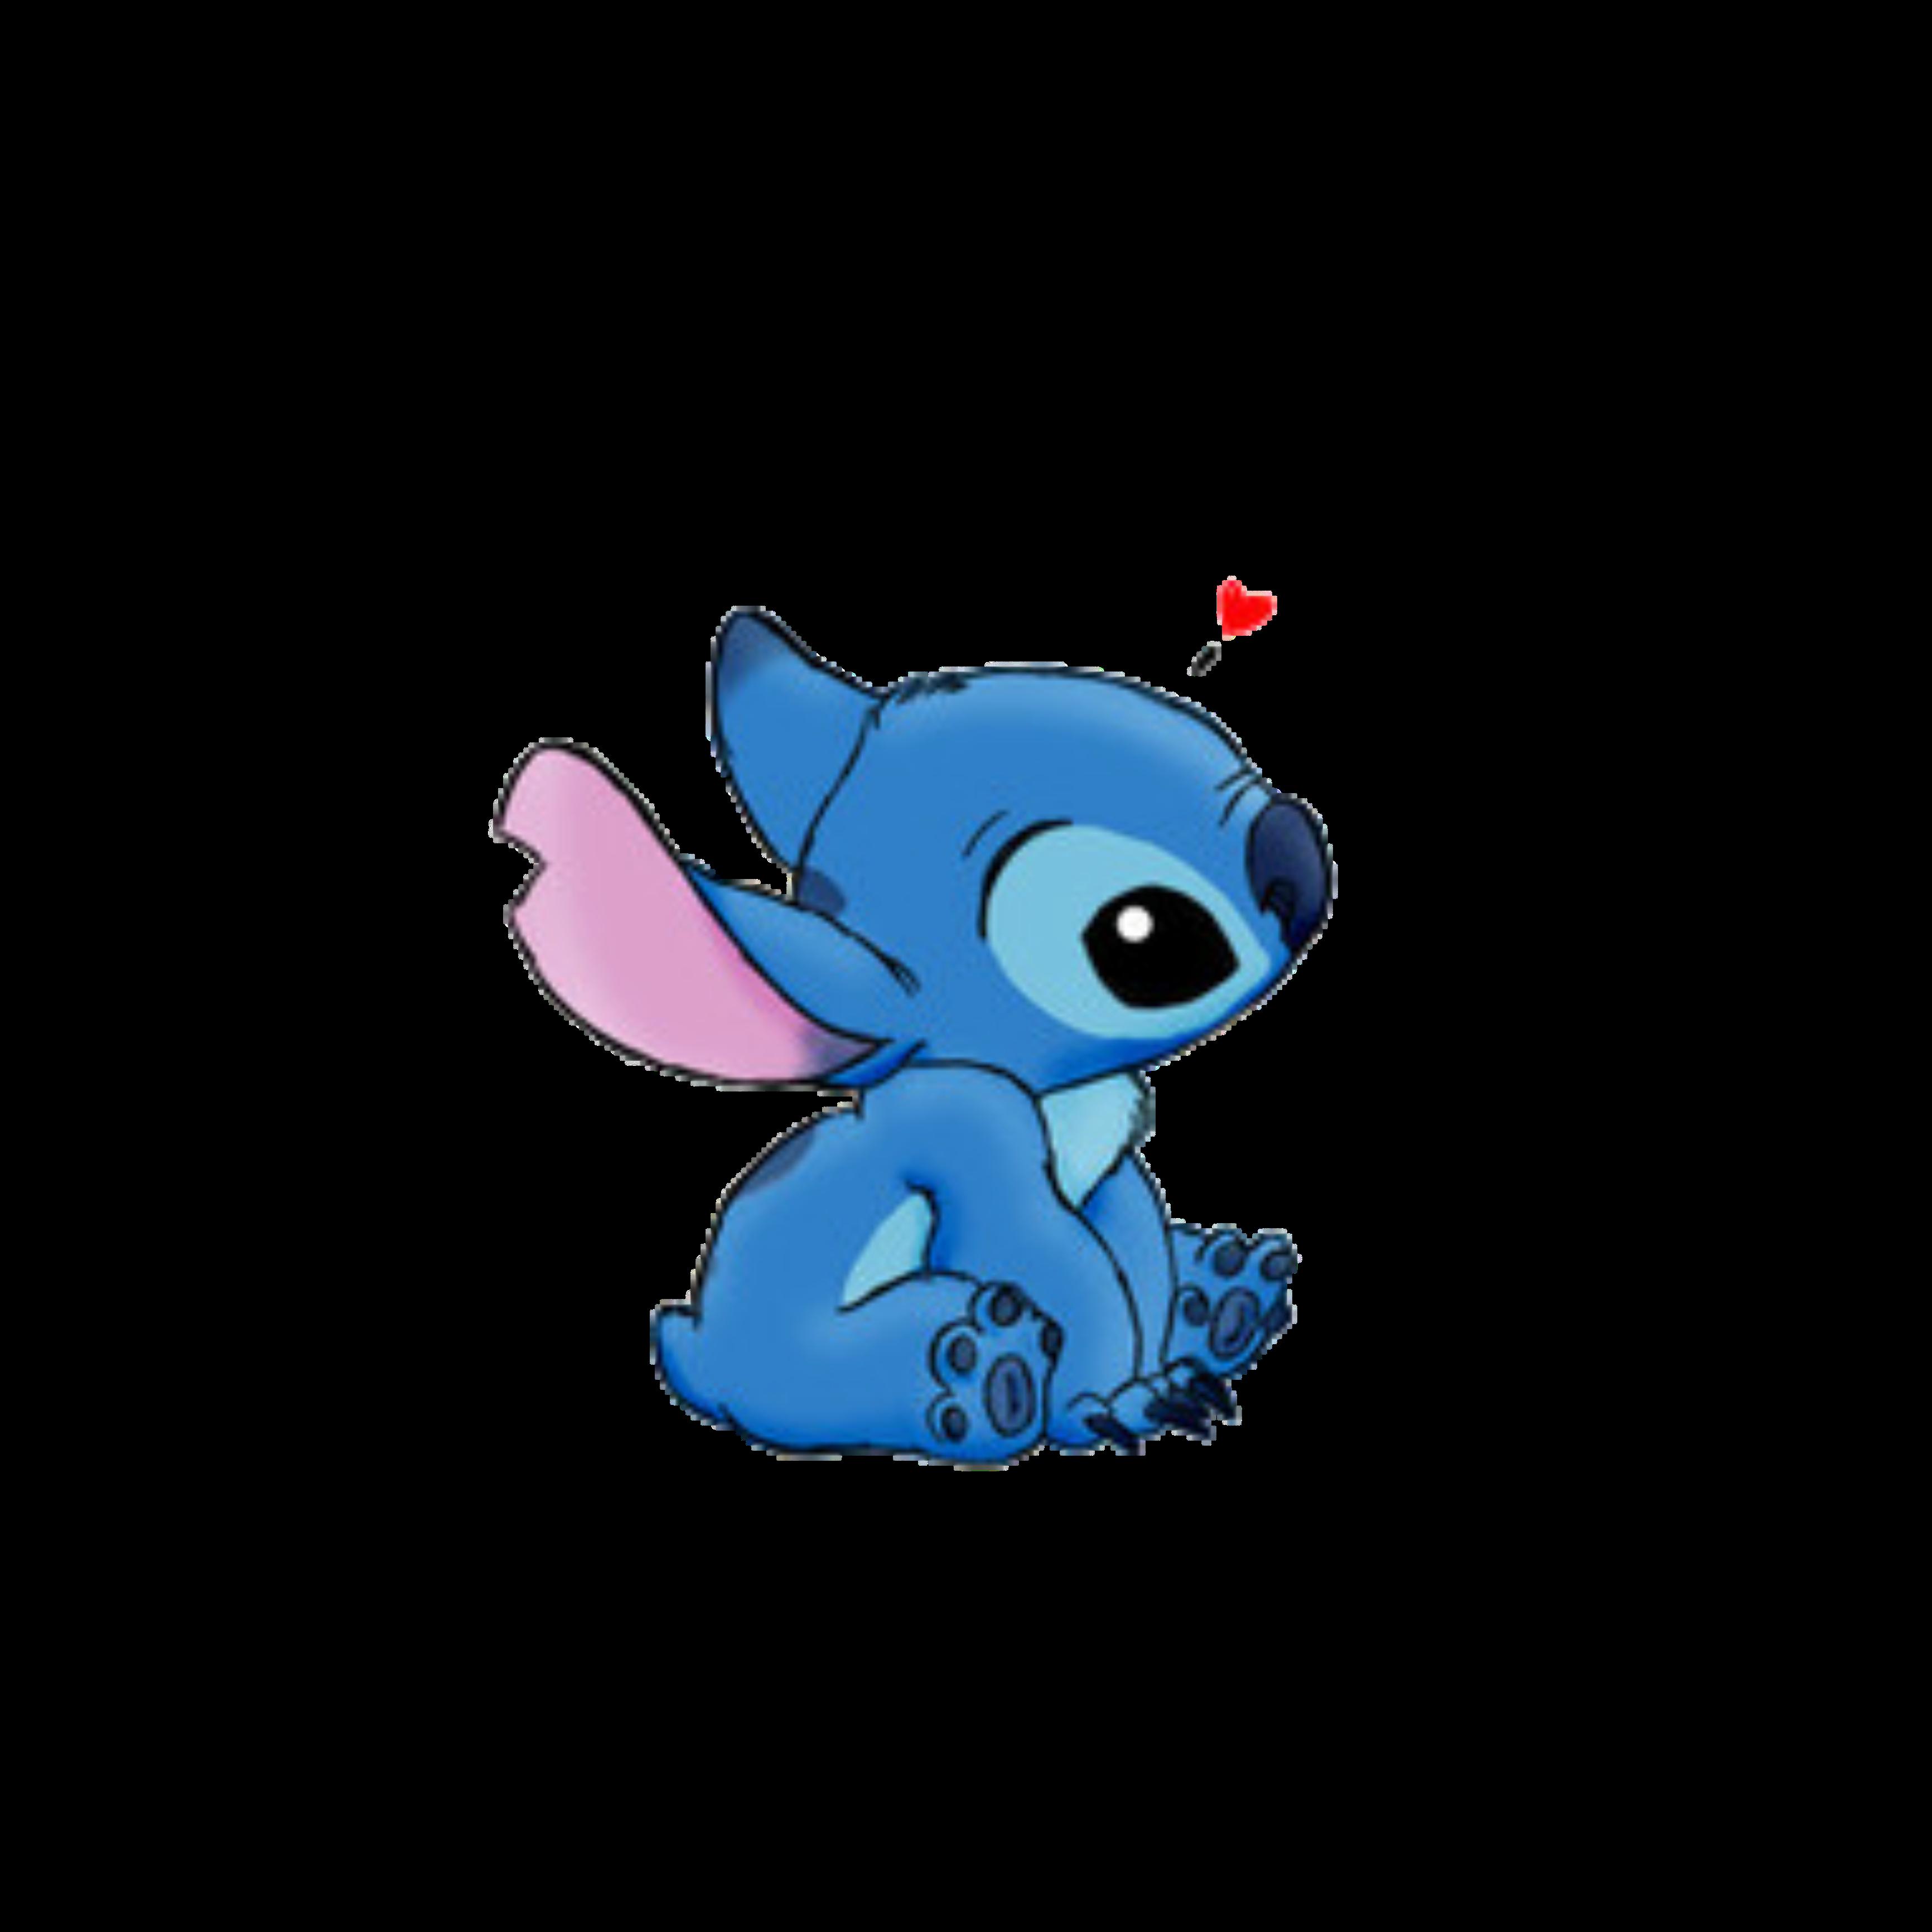 stitch cute aesthetic tumblr freetoedit...